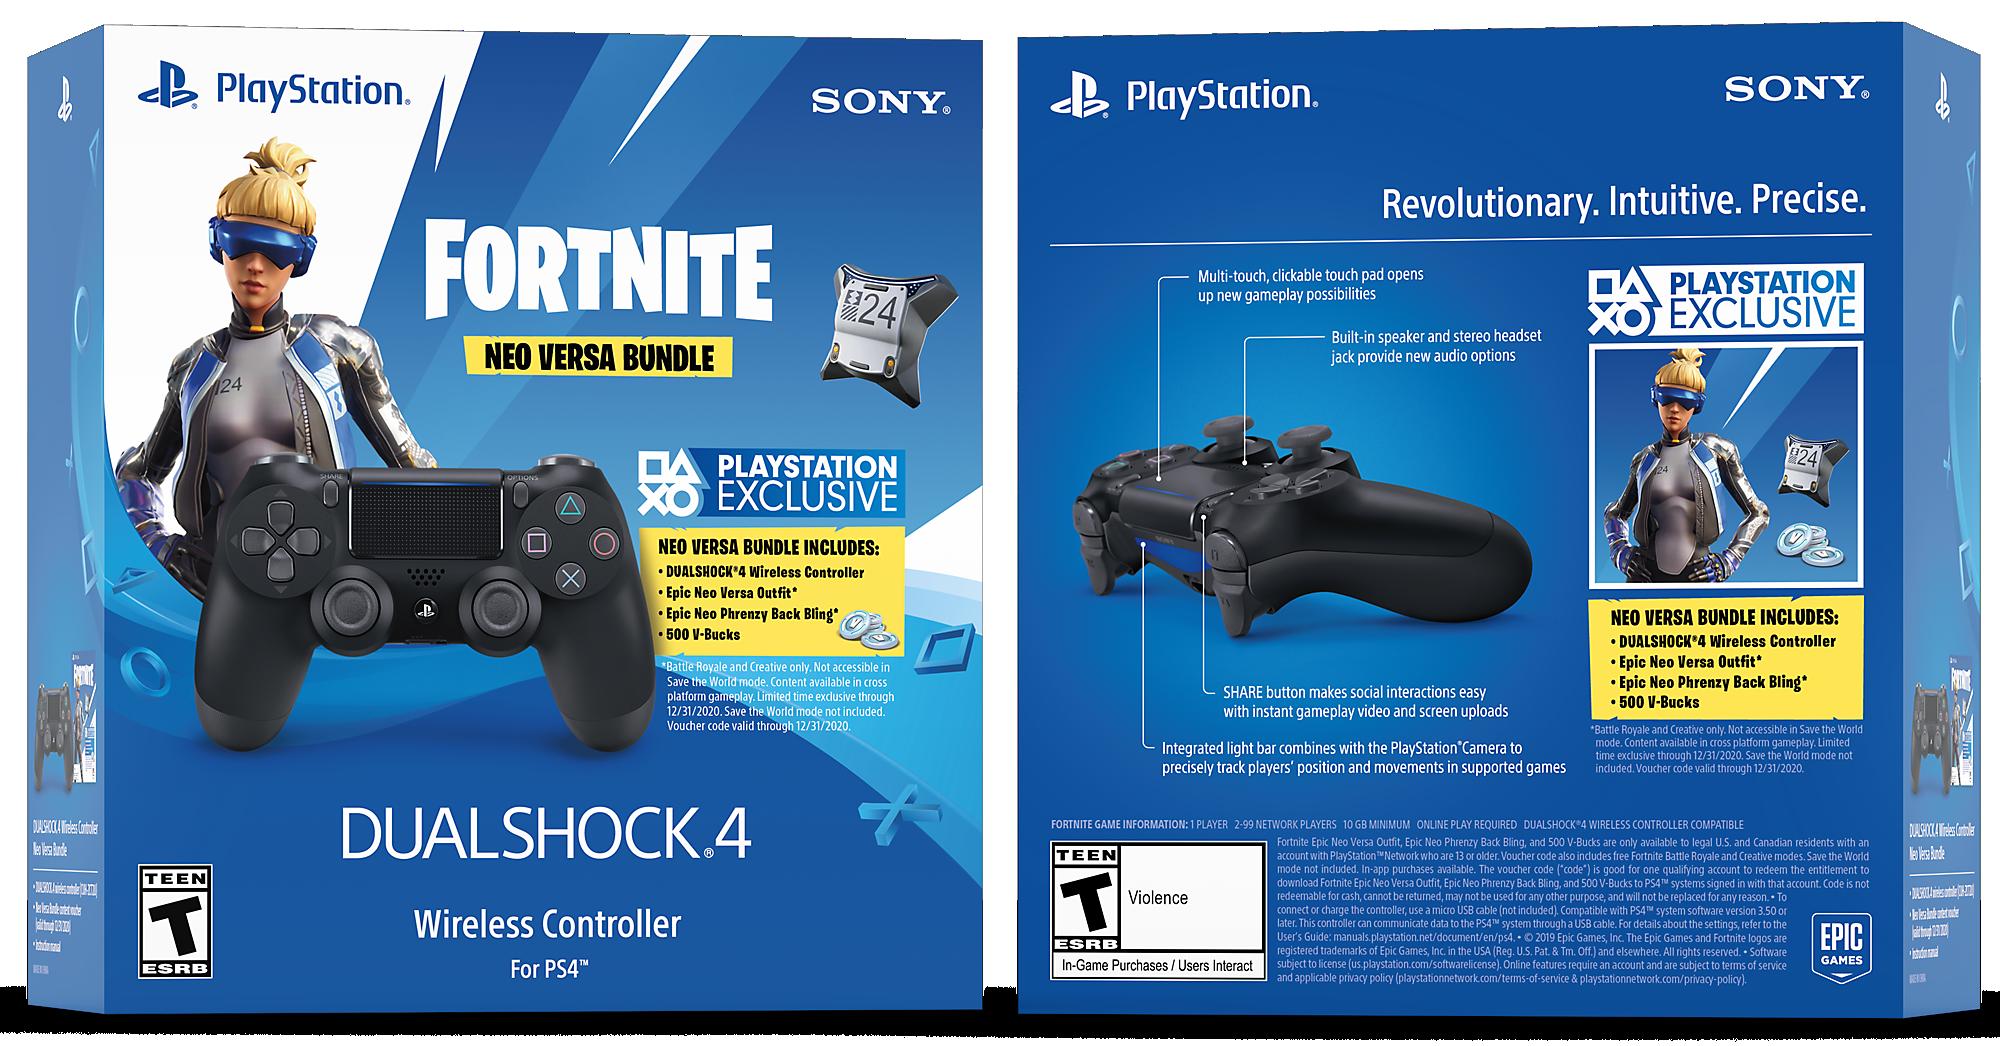 Fortnite Neo Versa DUALSHOCK®4 Wireless Controller Bundle